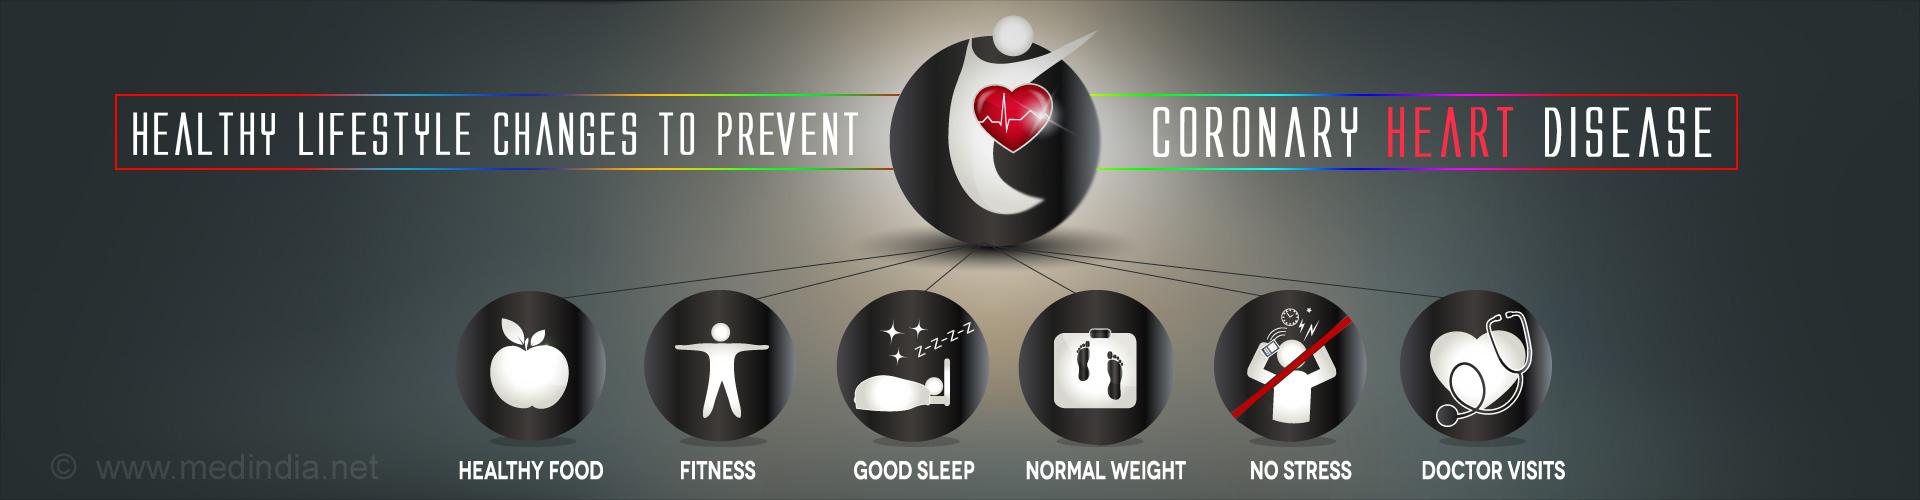 Coronary Heart Disease - Causes, Symptoms, Risk Factors, Diagnosis, Tretment